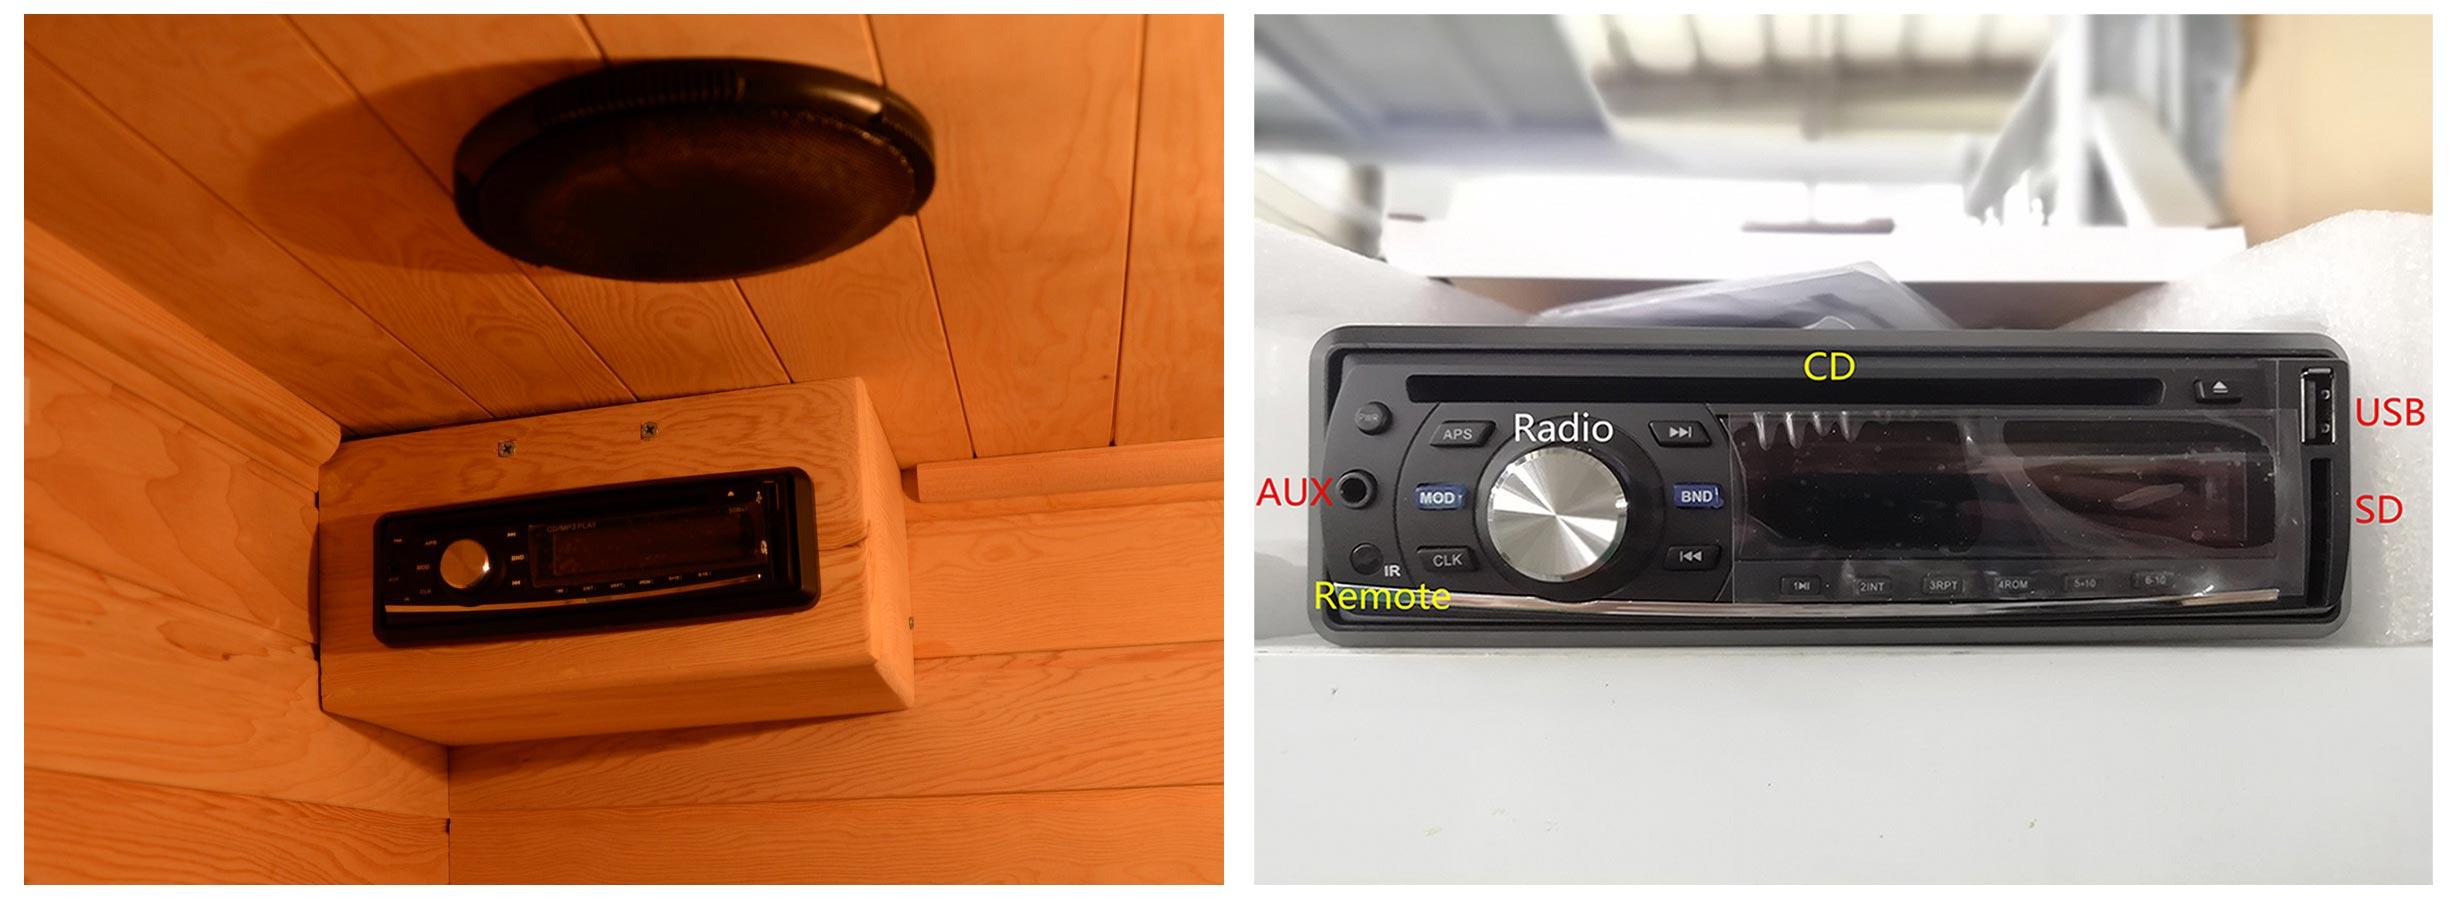 bionwell-2-szemelyes-infraszauna-beepitett-radio-CD-USB-AUX-SD